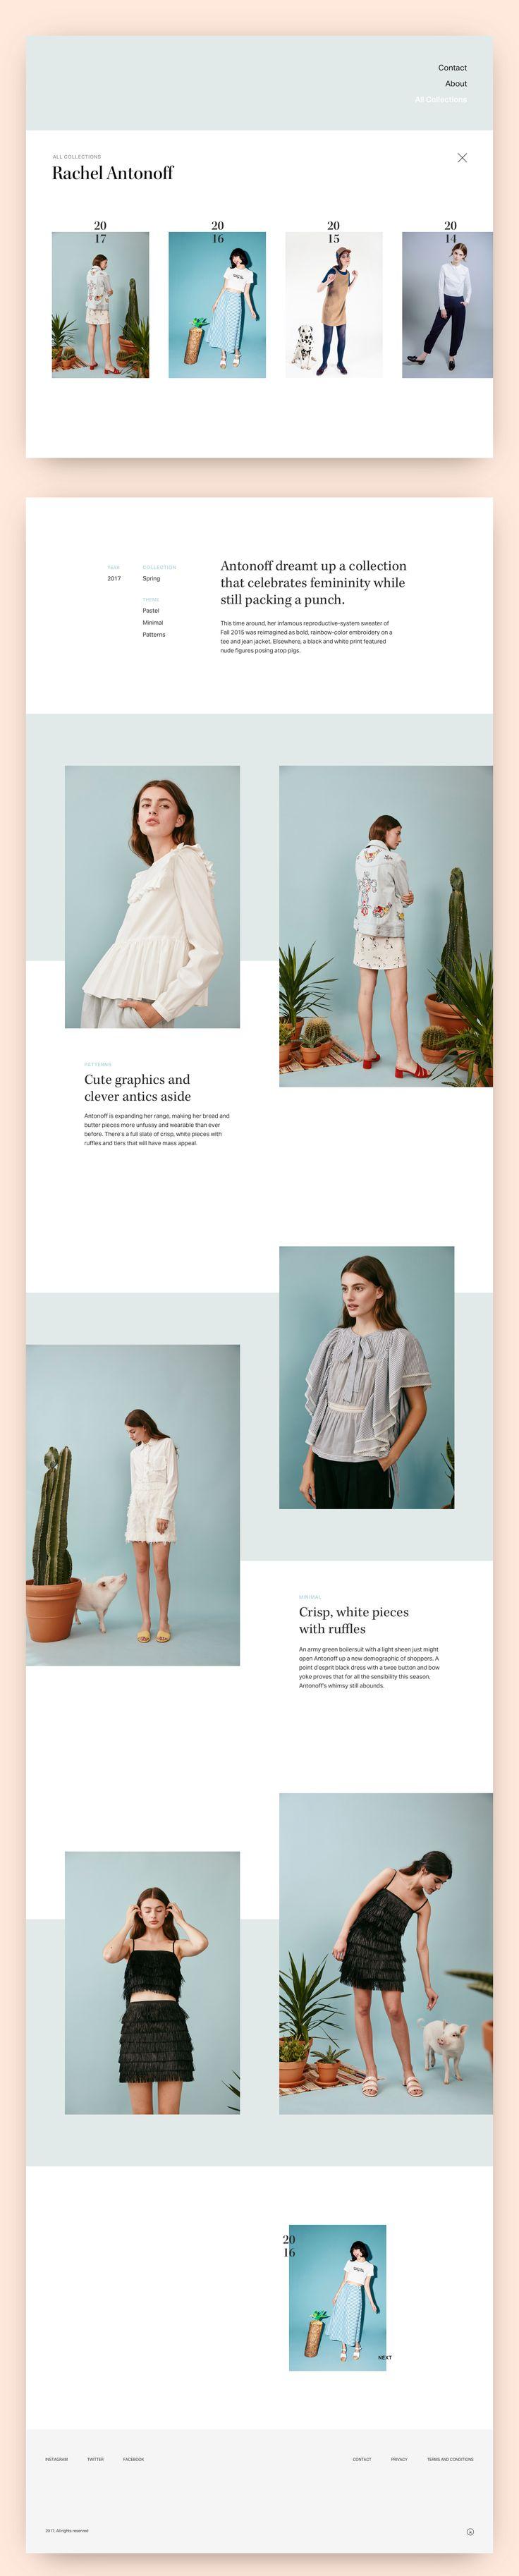 Collection page concept #ui #web #design